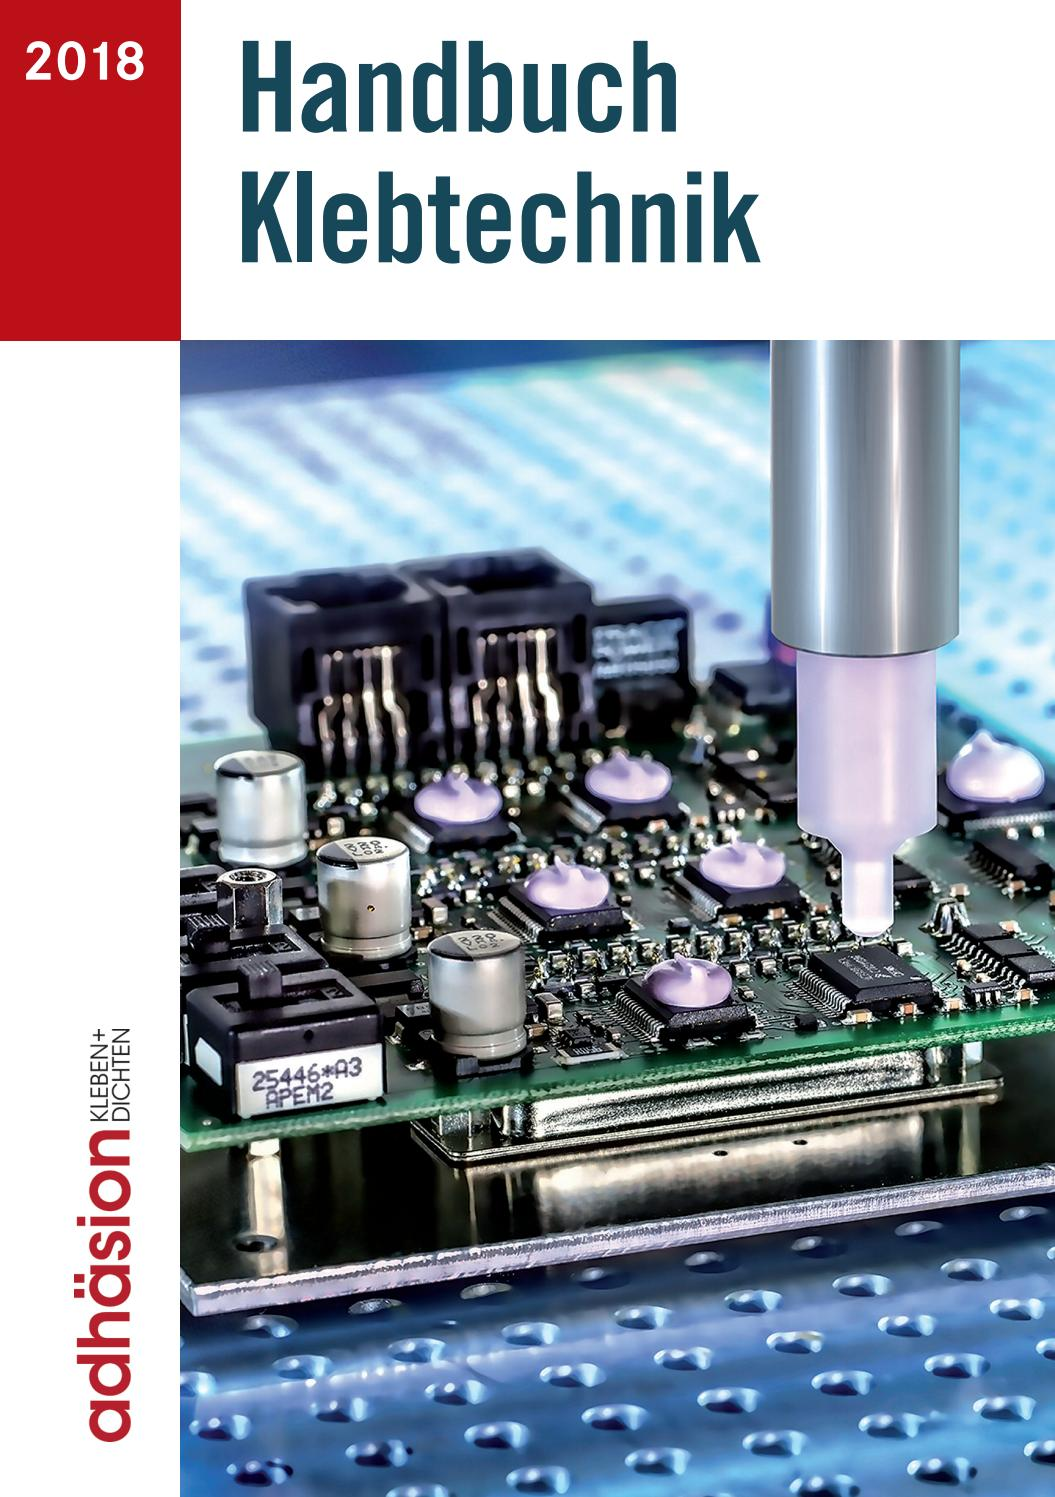 Handbuch Klebtechnik by duoo photography issuu